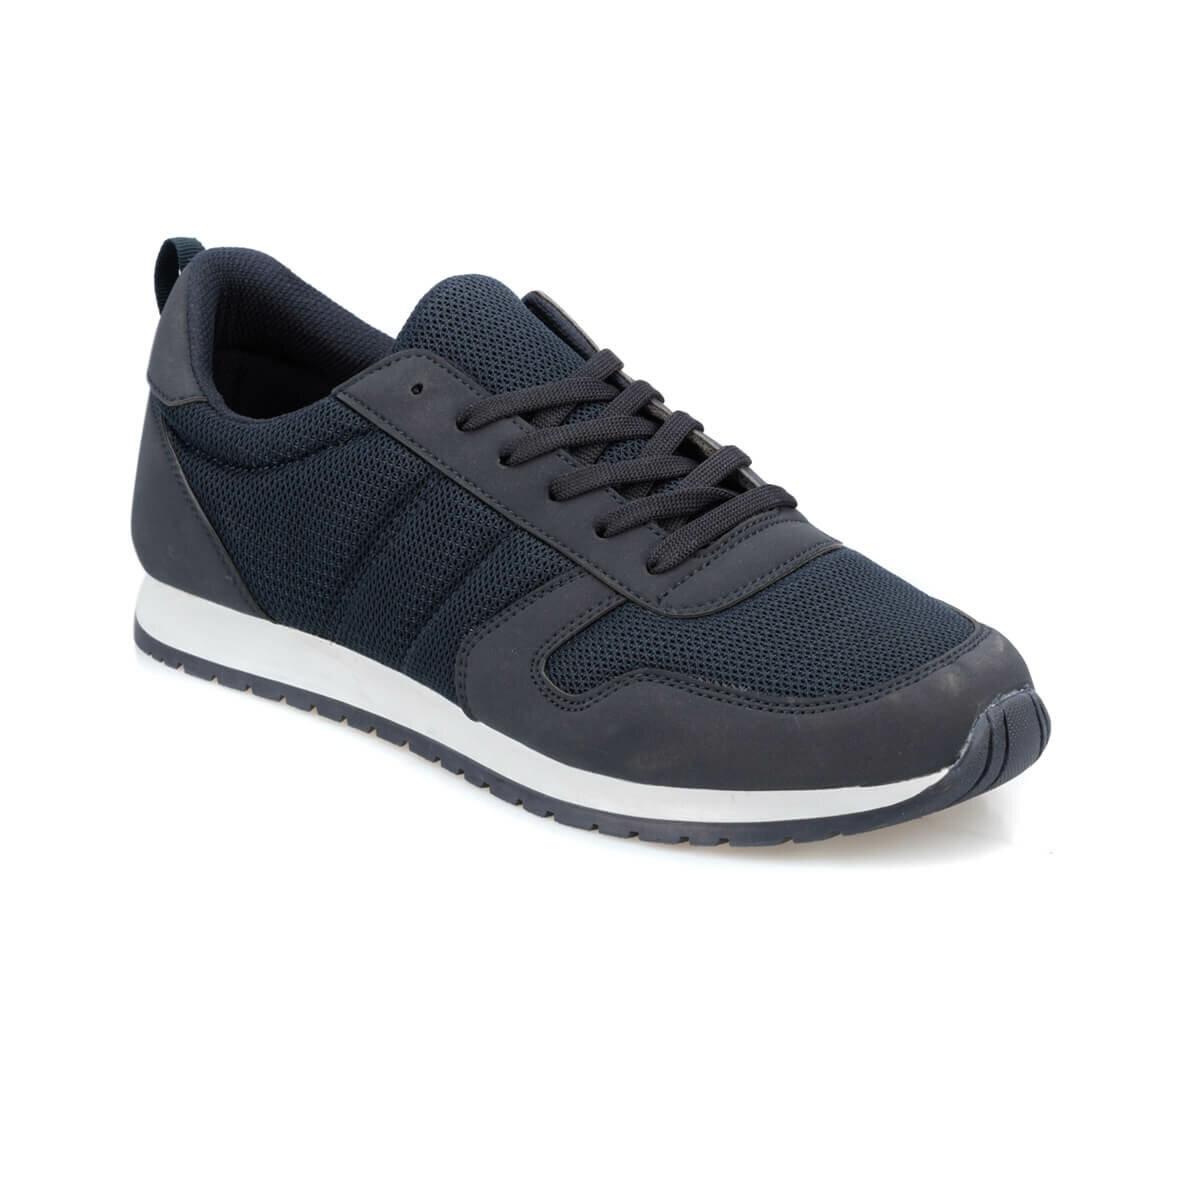 FLO Men Shoes Sneakers Summer Breathable Shoes Super Light Casual Shoes Male Tenis Masculino Sneakers Men Sports Shoes Polaris 91. 356062.M